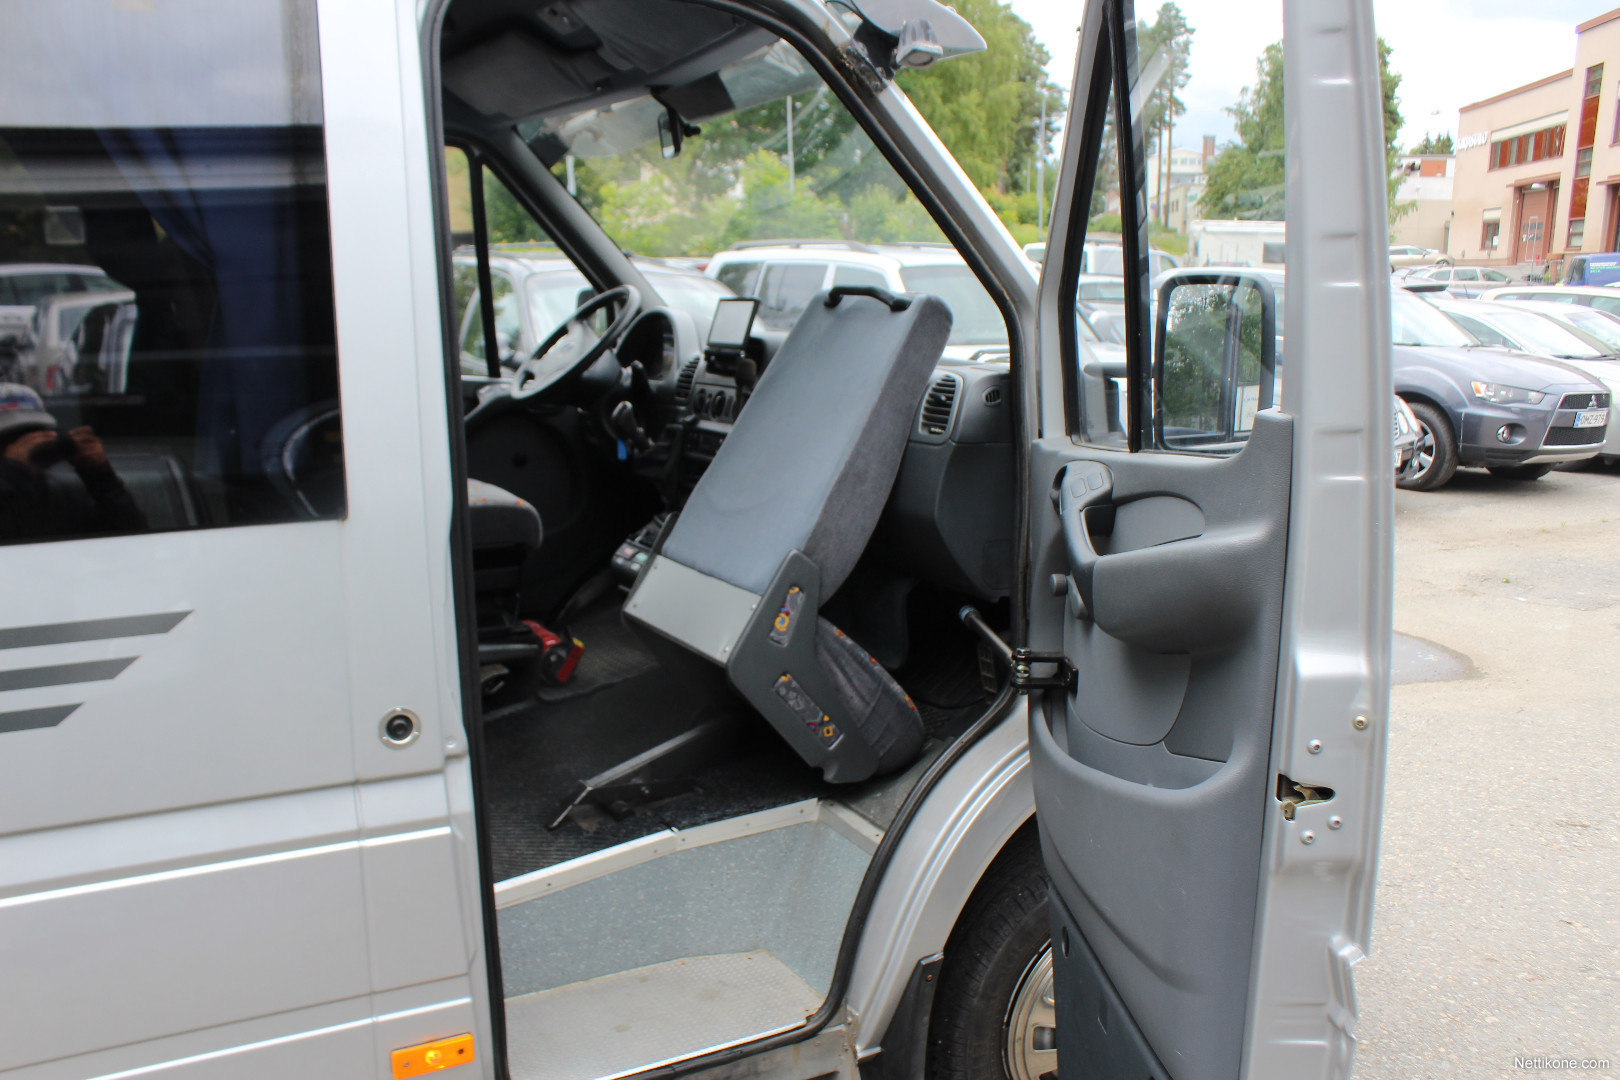 Mercedes-Benz 416 CDI-9046-4 6T-KASTEN/403 bus/coach, 2004 - Nettikone